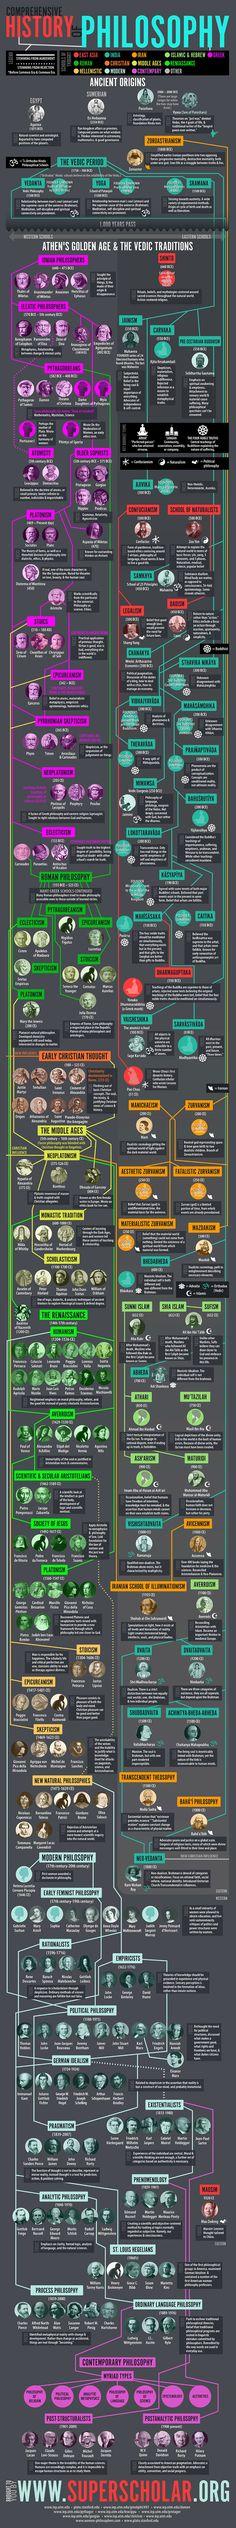 History of Philosophy Infographic #philosopher